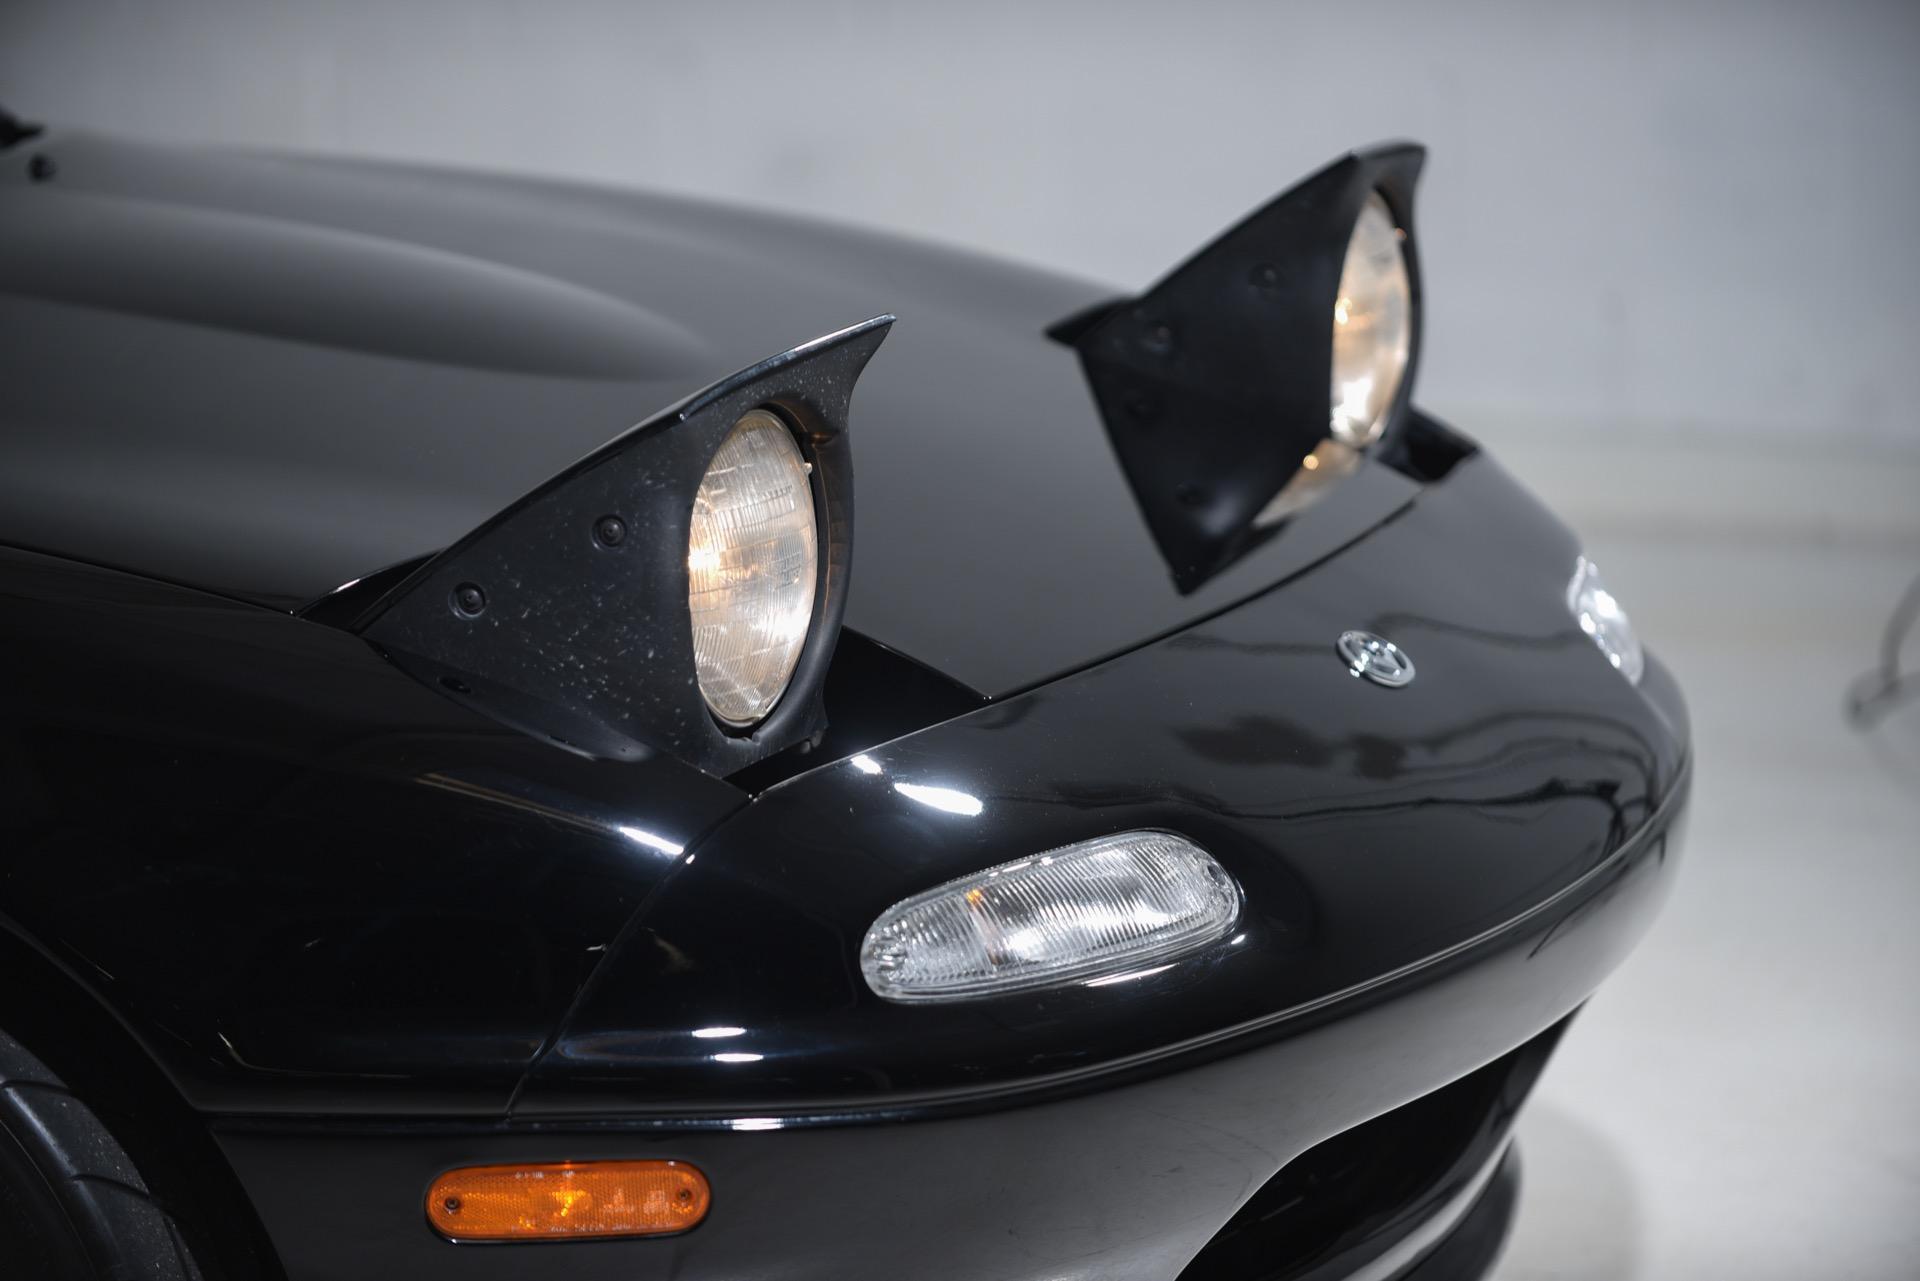 1994 Mazda Miata R-Package